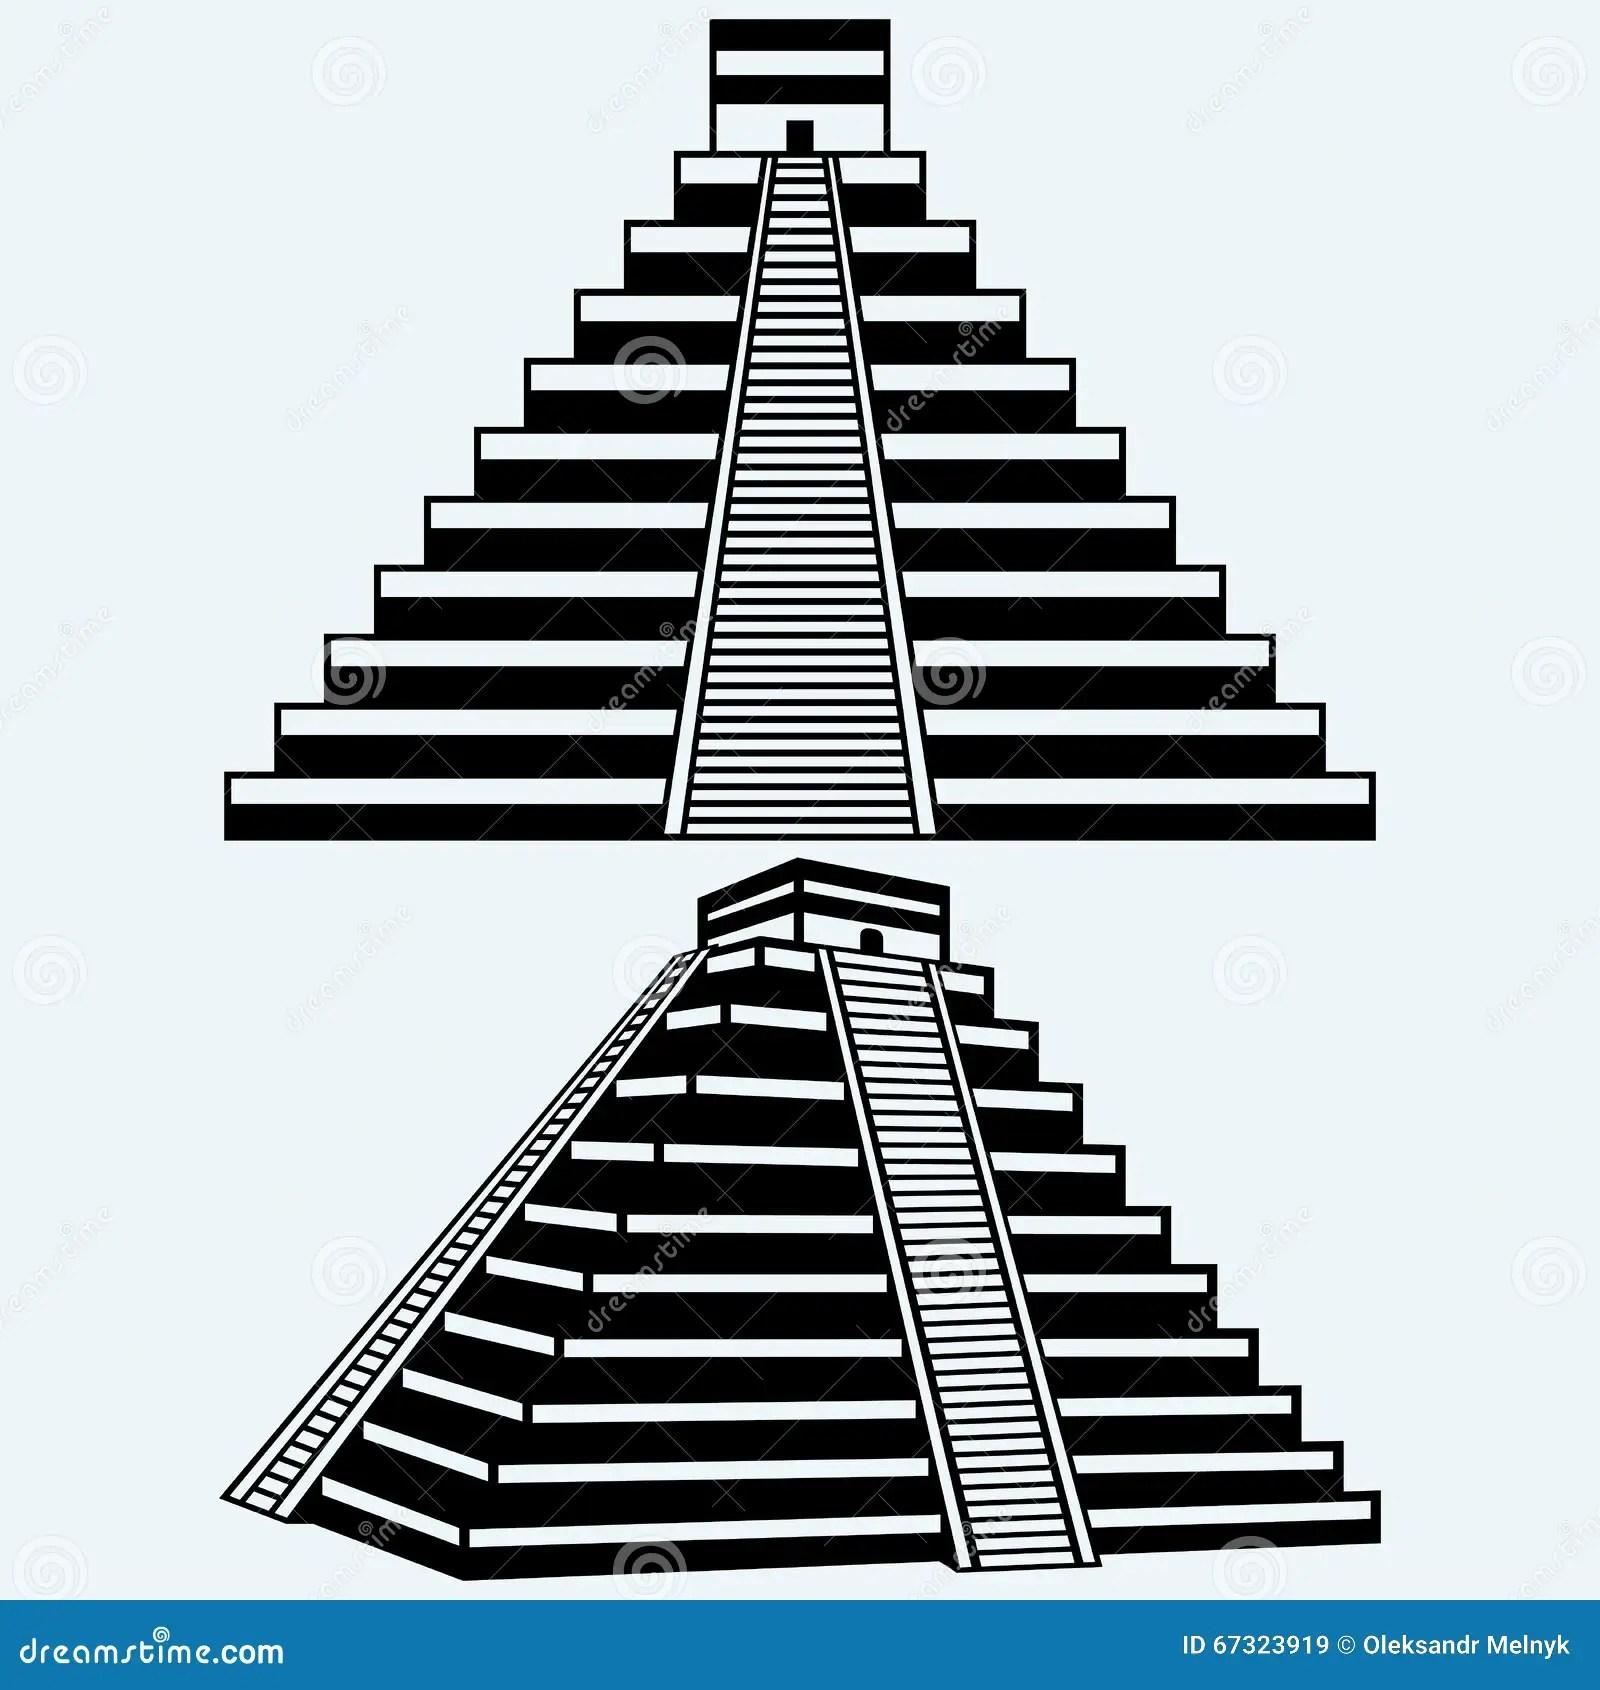 Piramides Aztecas Dibujos Wwwtopsimagescom